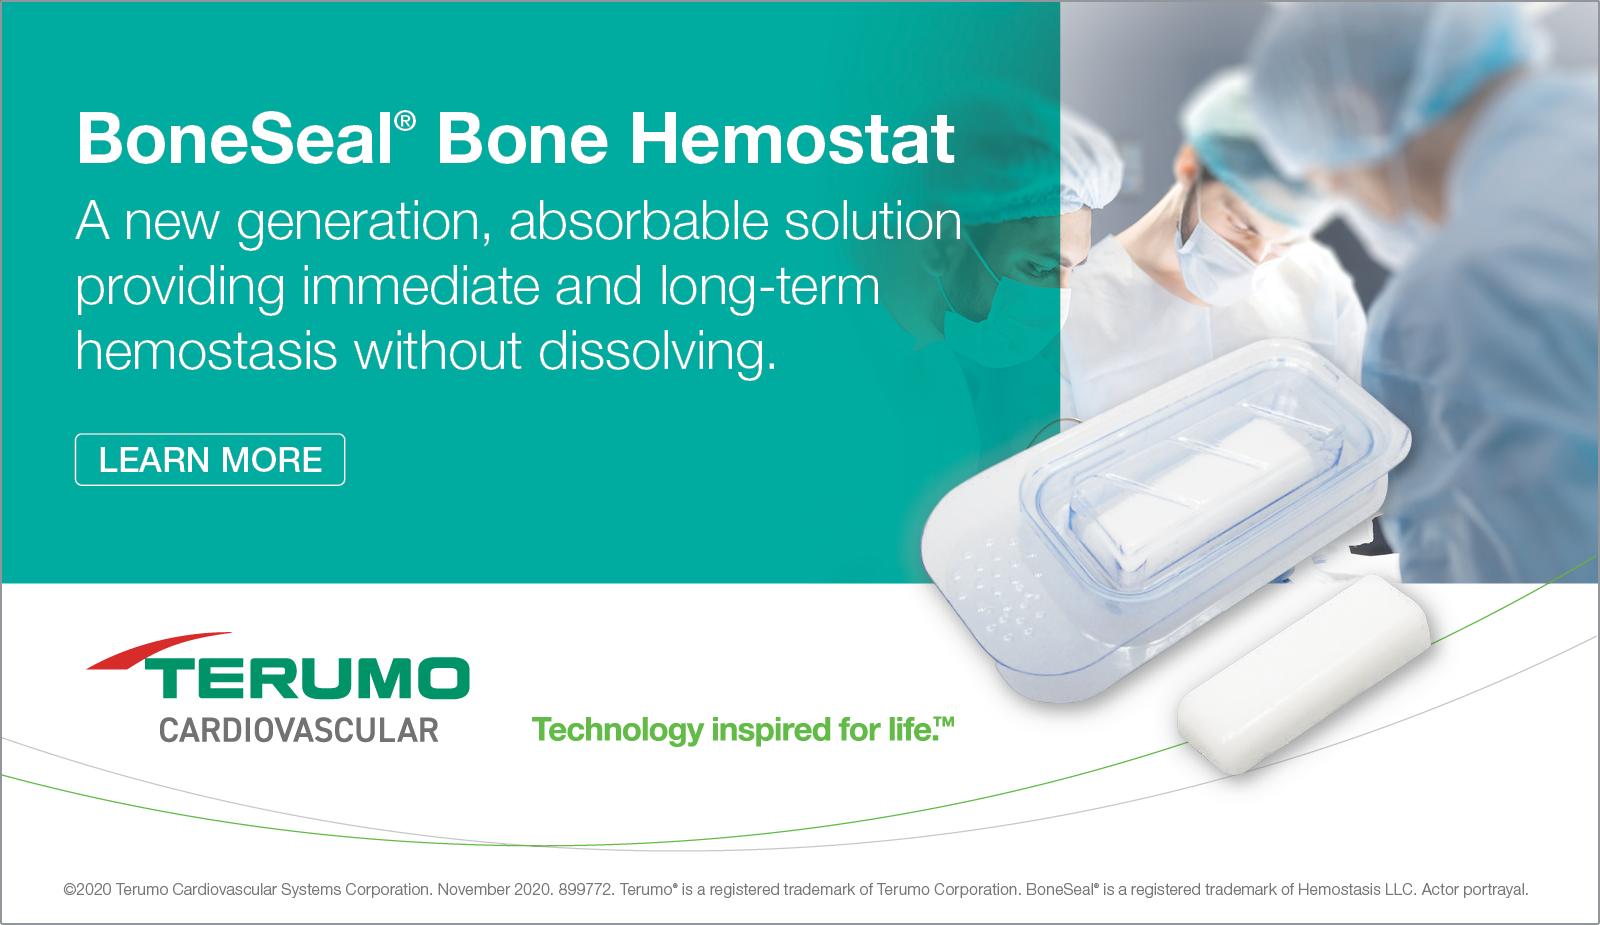 Terumo - BoneSeal Bone Hemostat